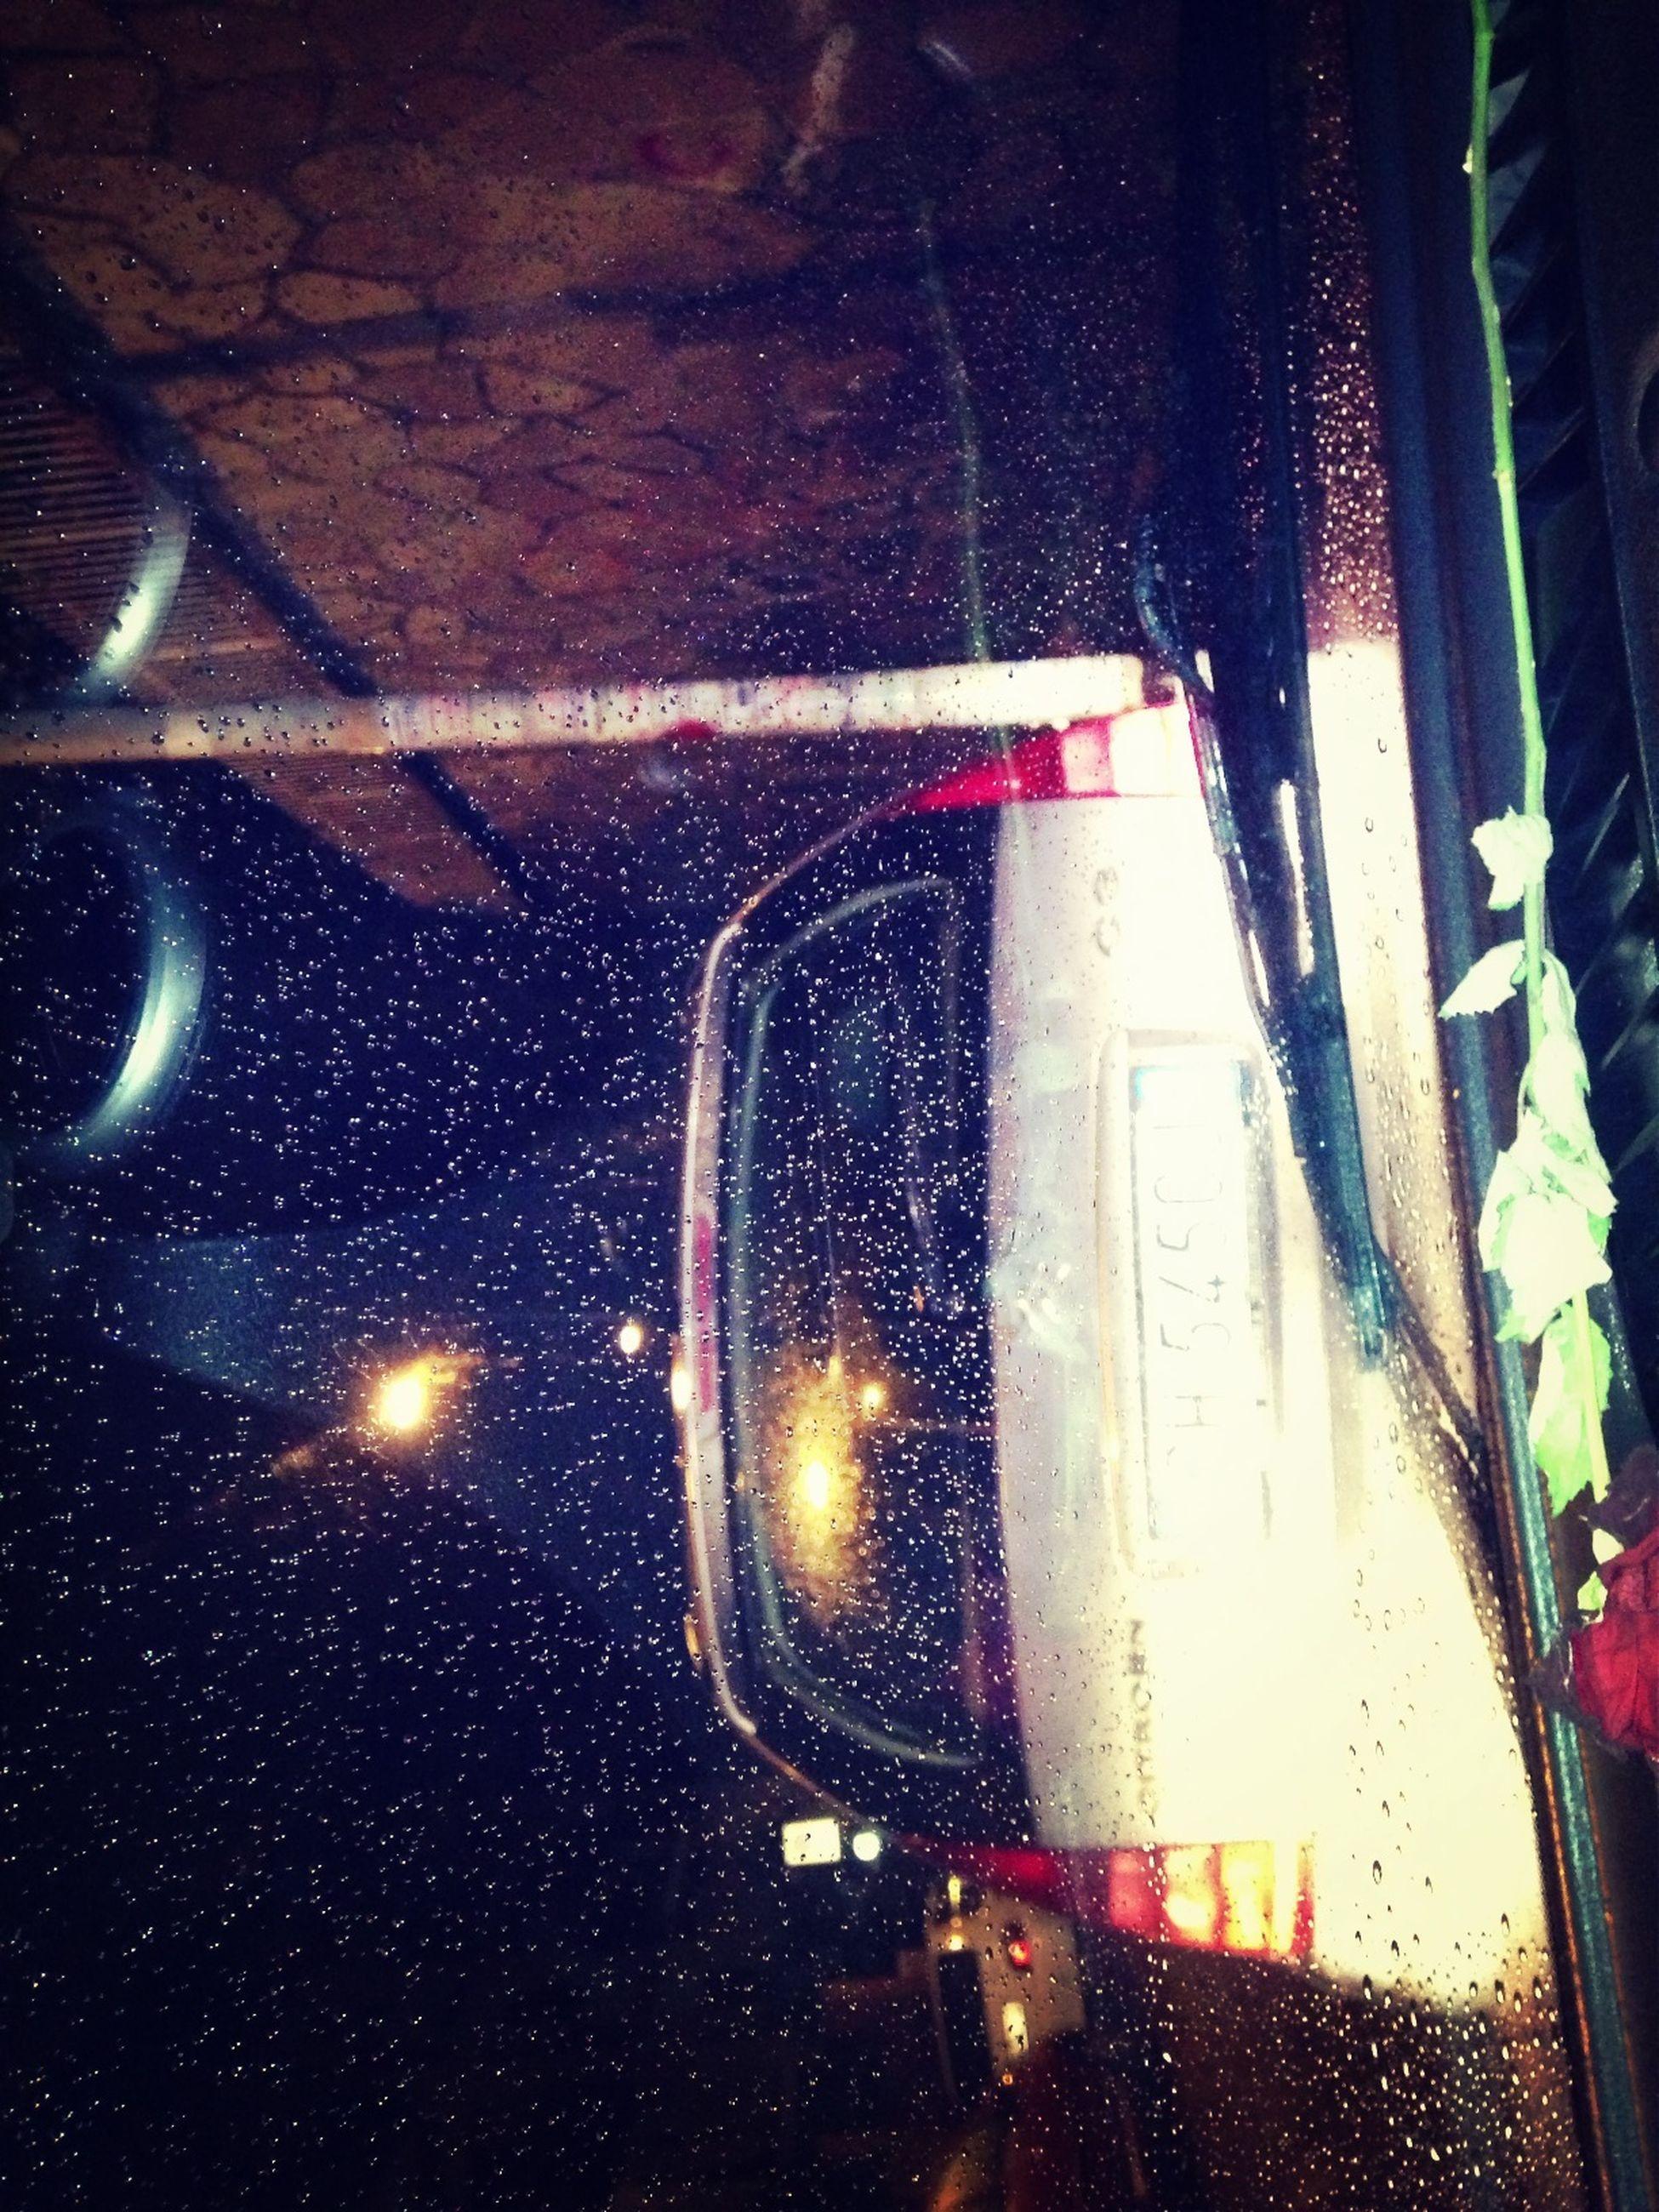 transportation, mode of transport, land vehicle, car, vehicle interior, glass - material, transparent, illuminated, indoors, window, train - vehicle, windshield, close-up, rail transportation, public transportation, headlight, wet, reflection, railroad track, travel